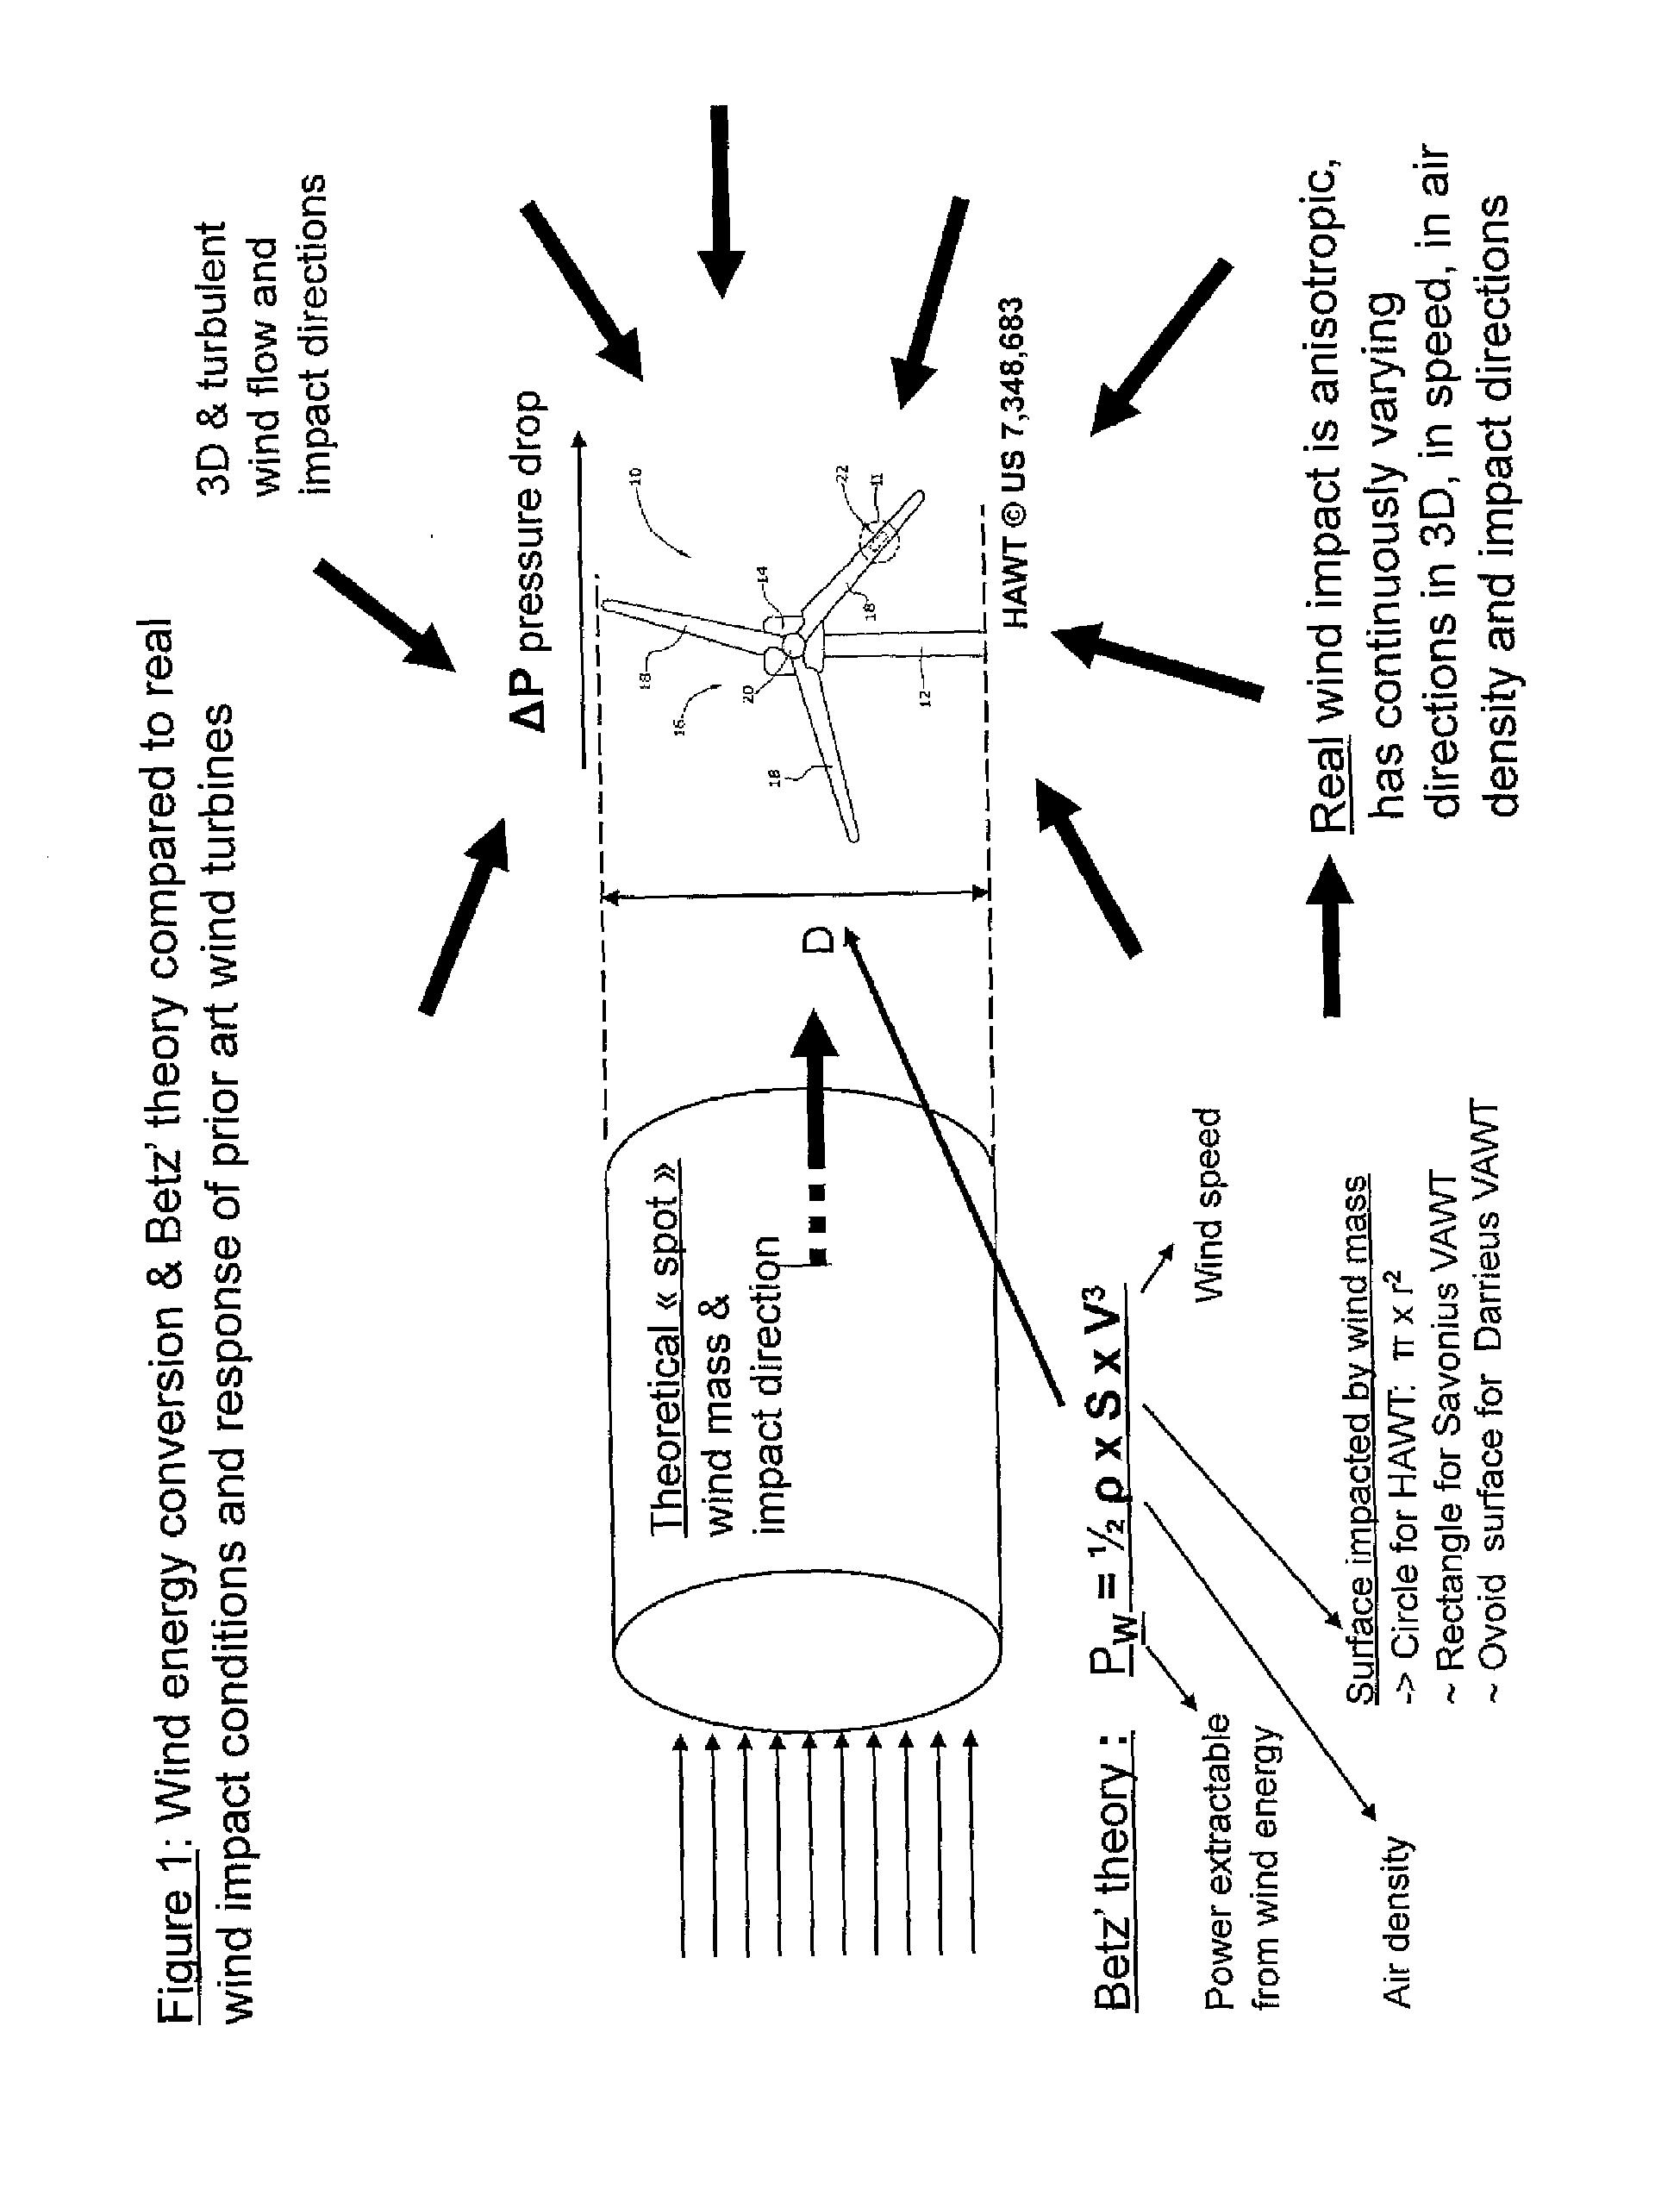 Zf 9509  Wind Turbine System Block Diagram Sma Sunny